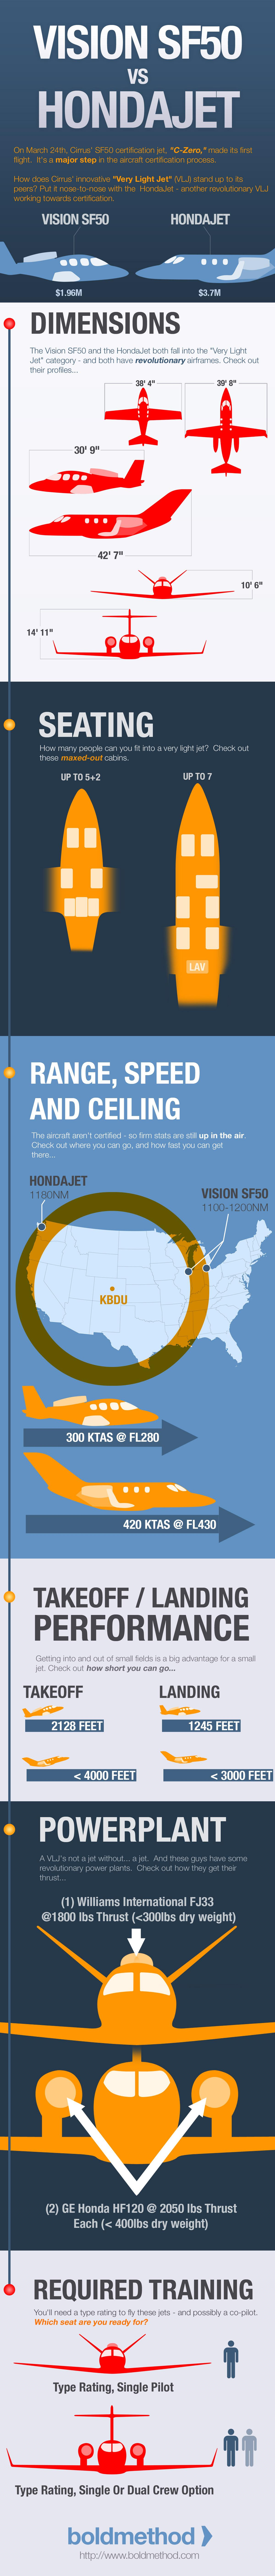 Cirrus Vision SF50 vs HondaJet Desktop v2 Honda jet